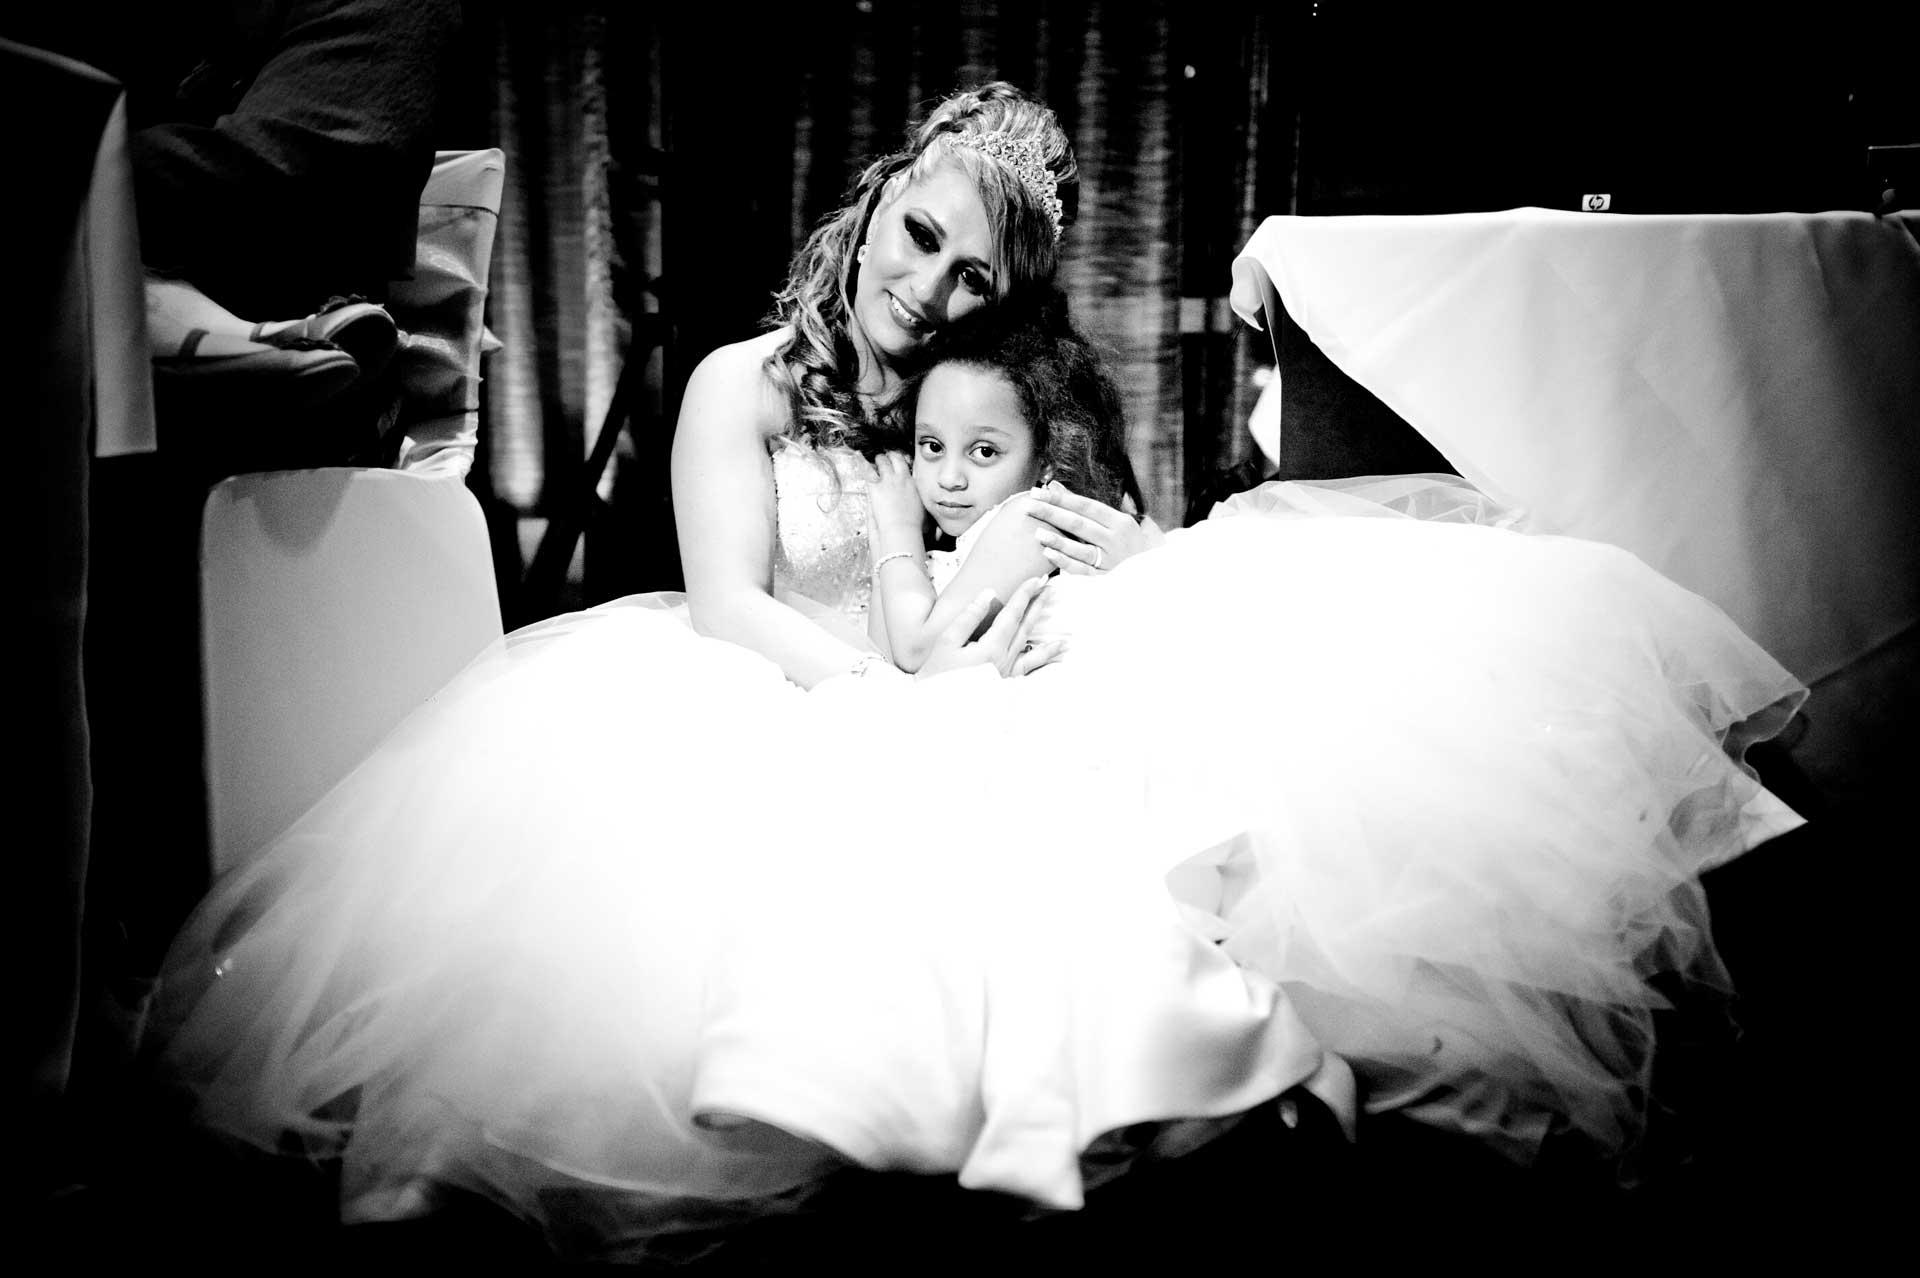 newlywed and daughter hug